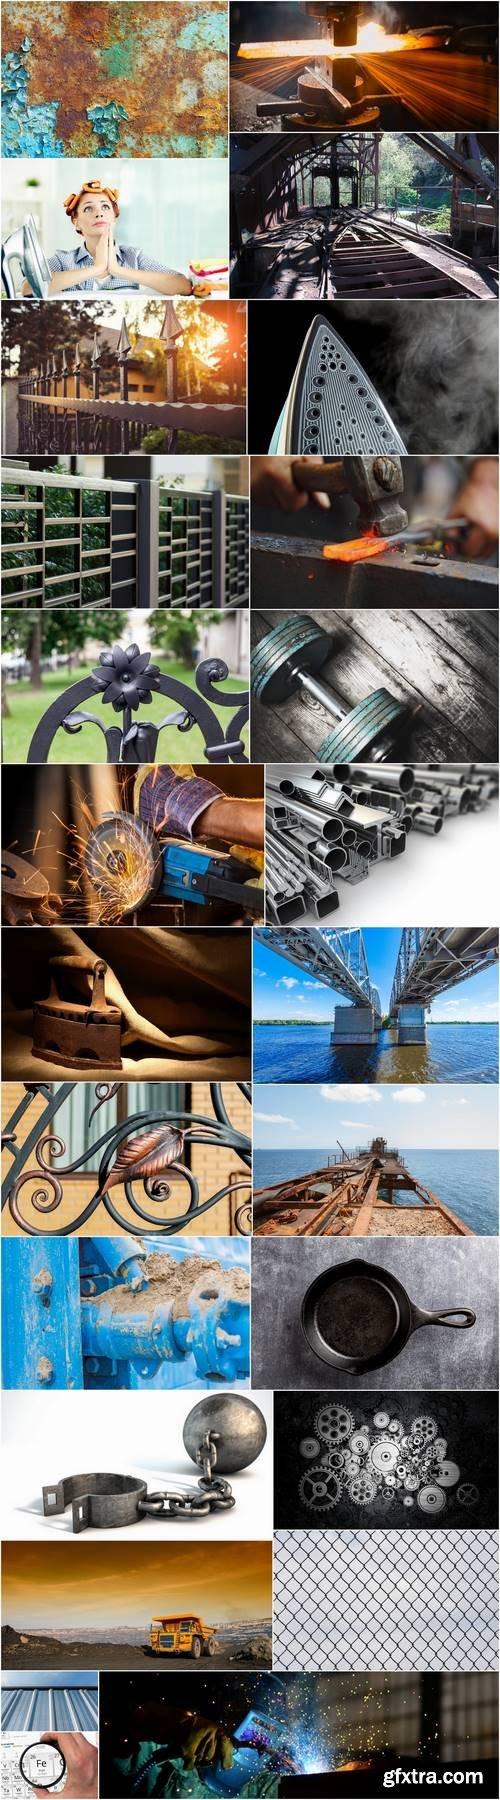 Articles of iron metal tin watering iron steel 25 HQ Jpeg